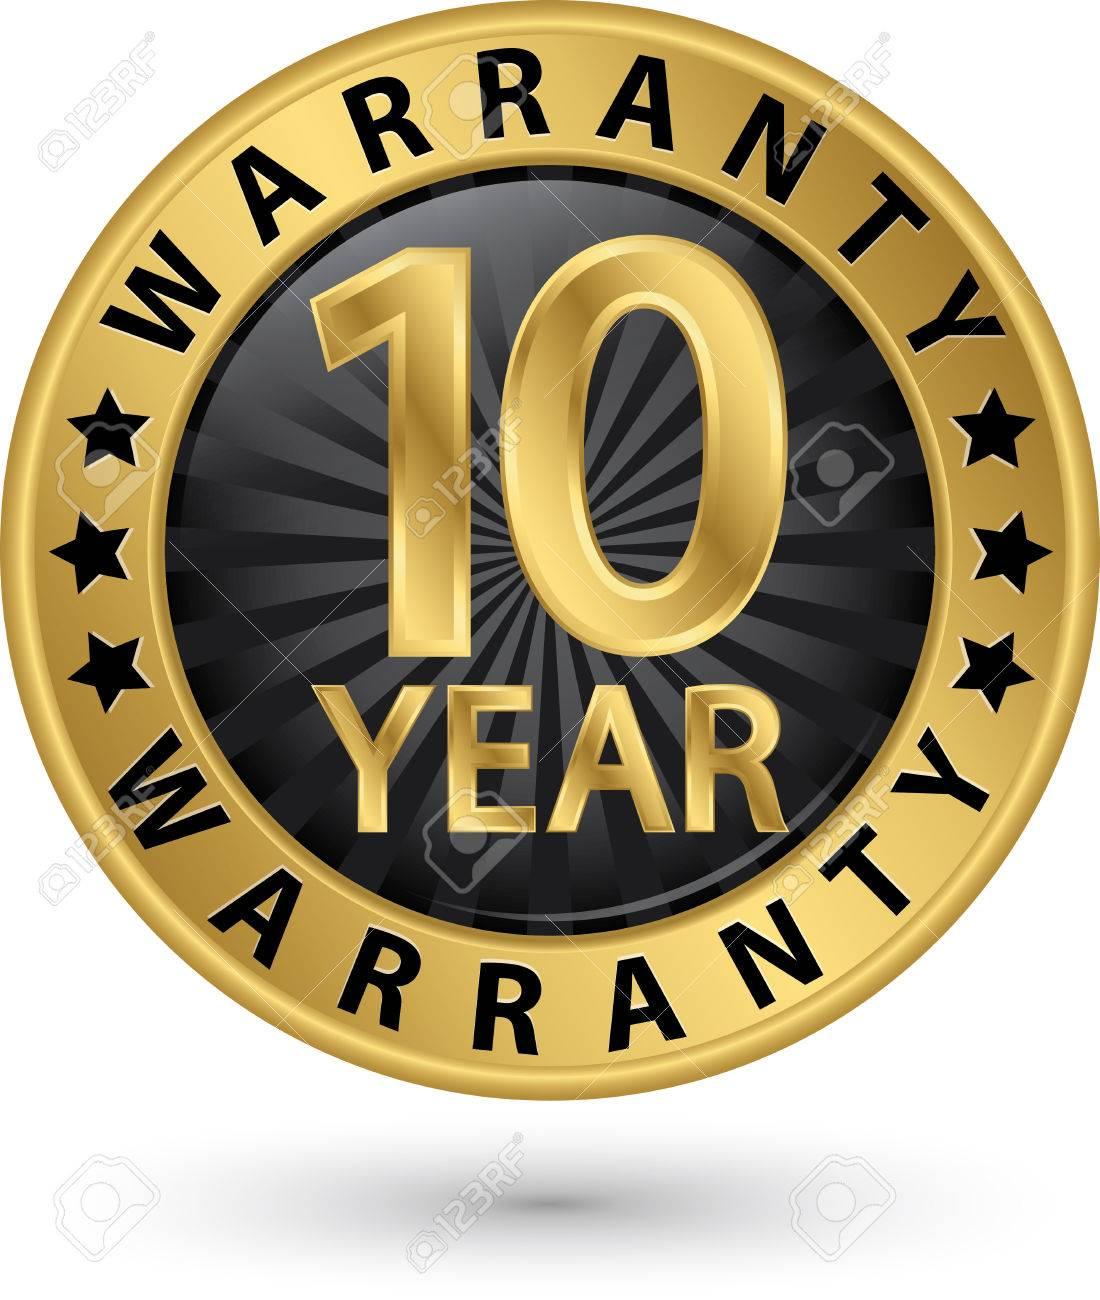 10 year warranty golden label, vector illustration - 51816435